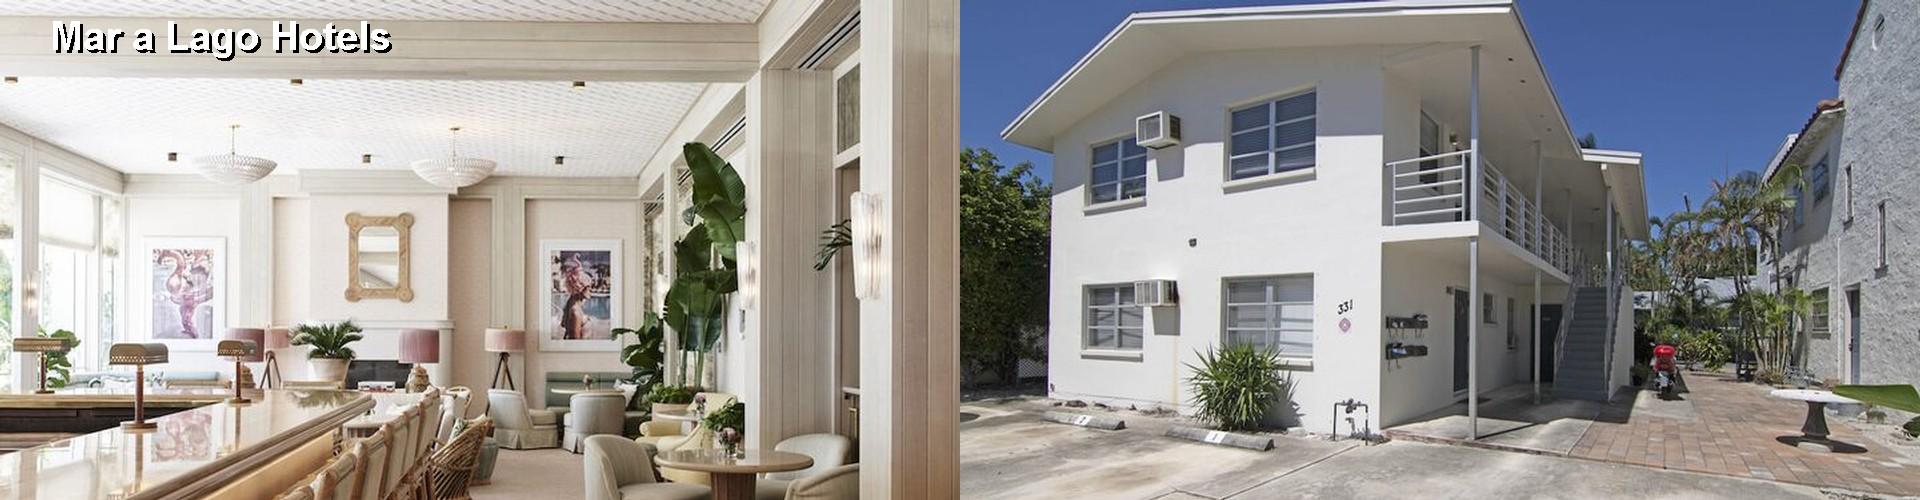 $48+ hotels near mar a lago in palm beach (fl)